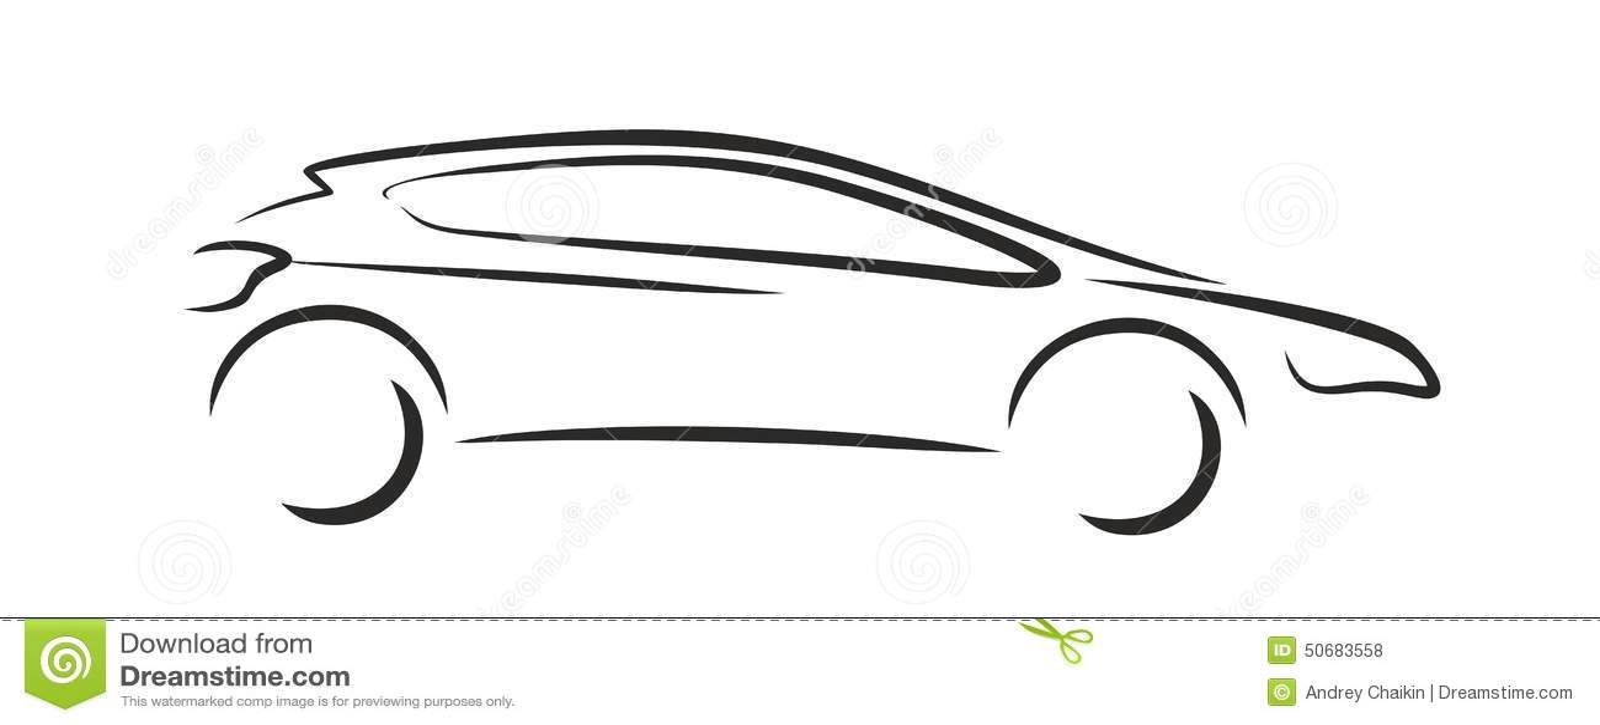 Cars logo stock vector. Illustration of races, transport - 50683558